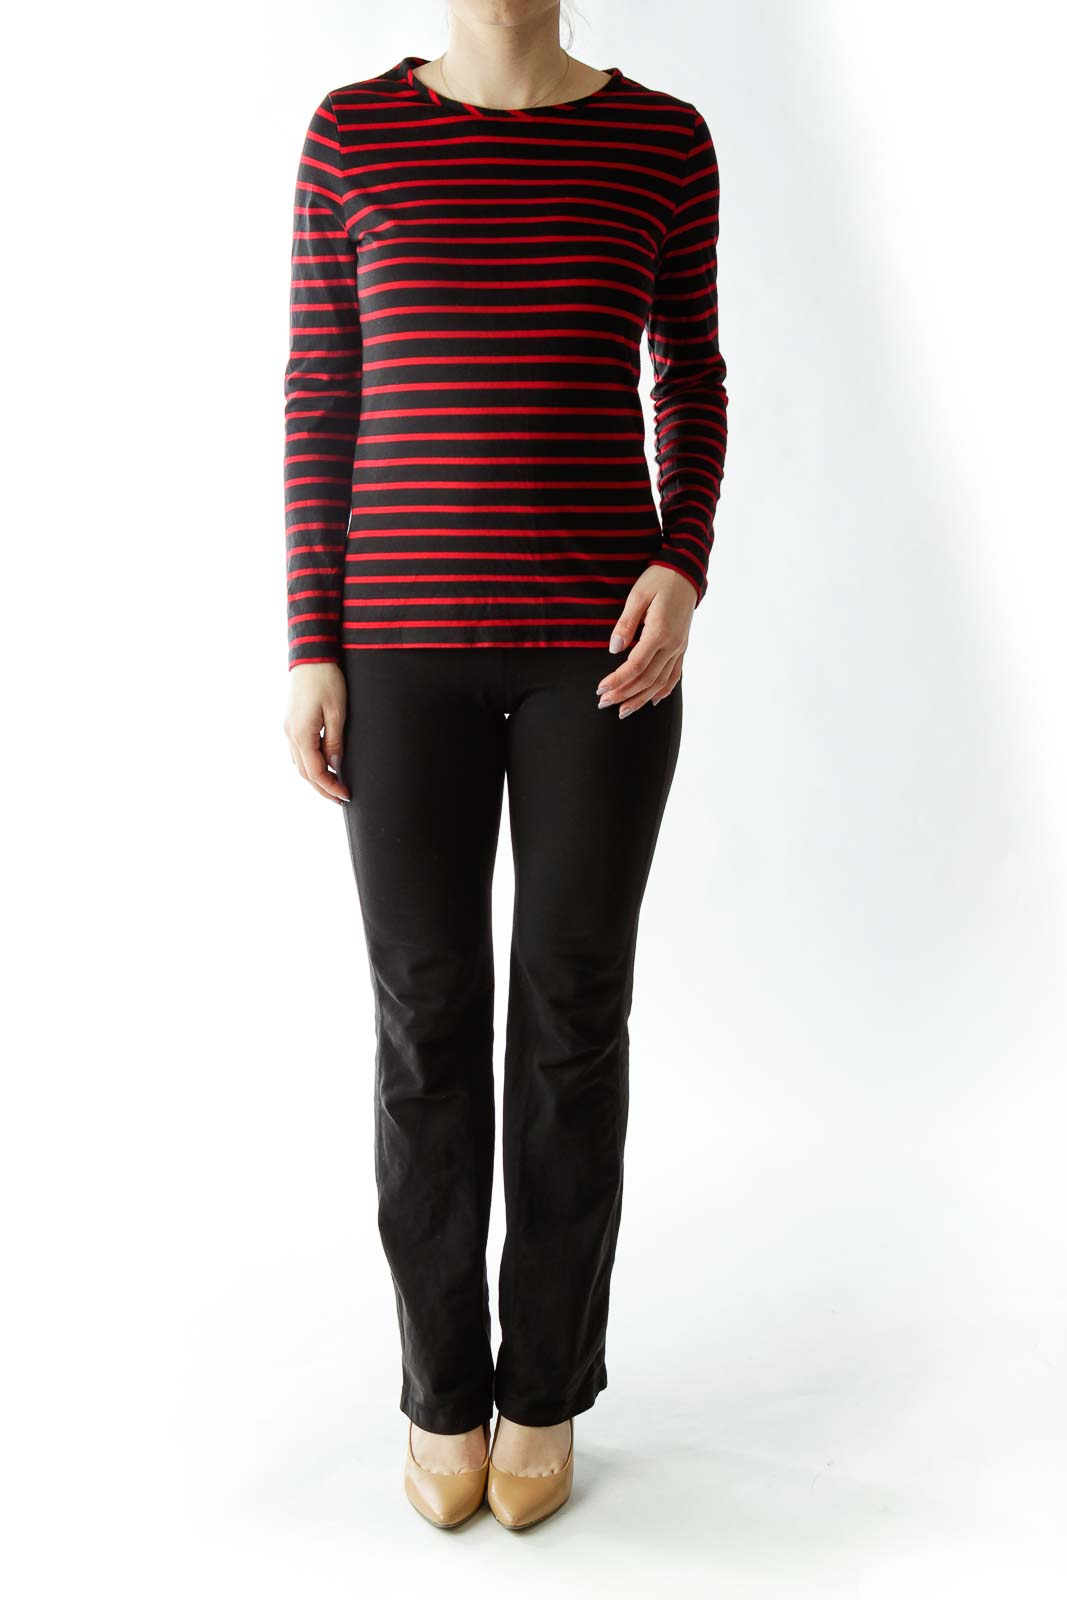 Black Red Striped T-Shirt